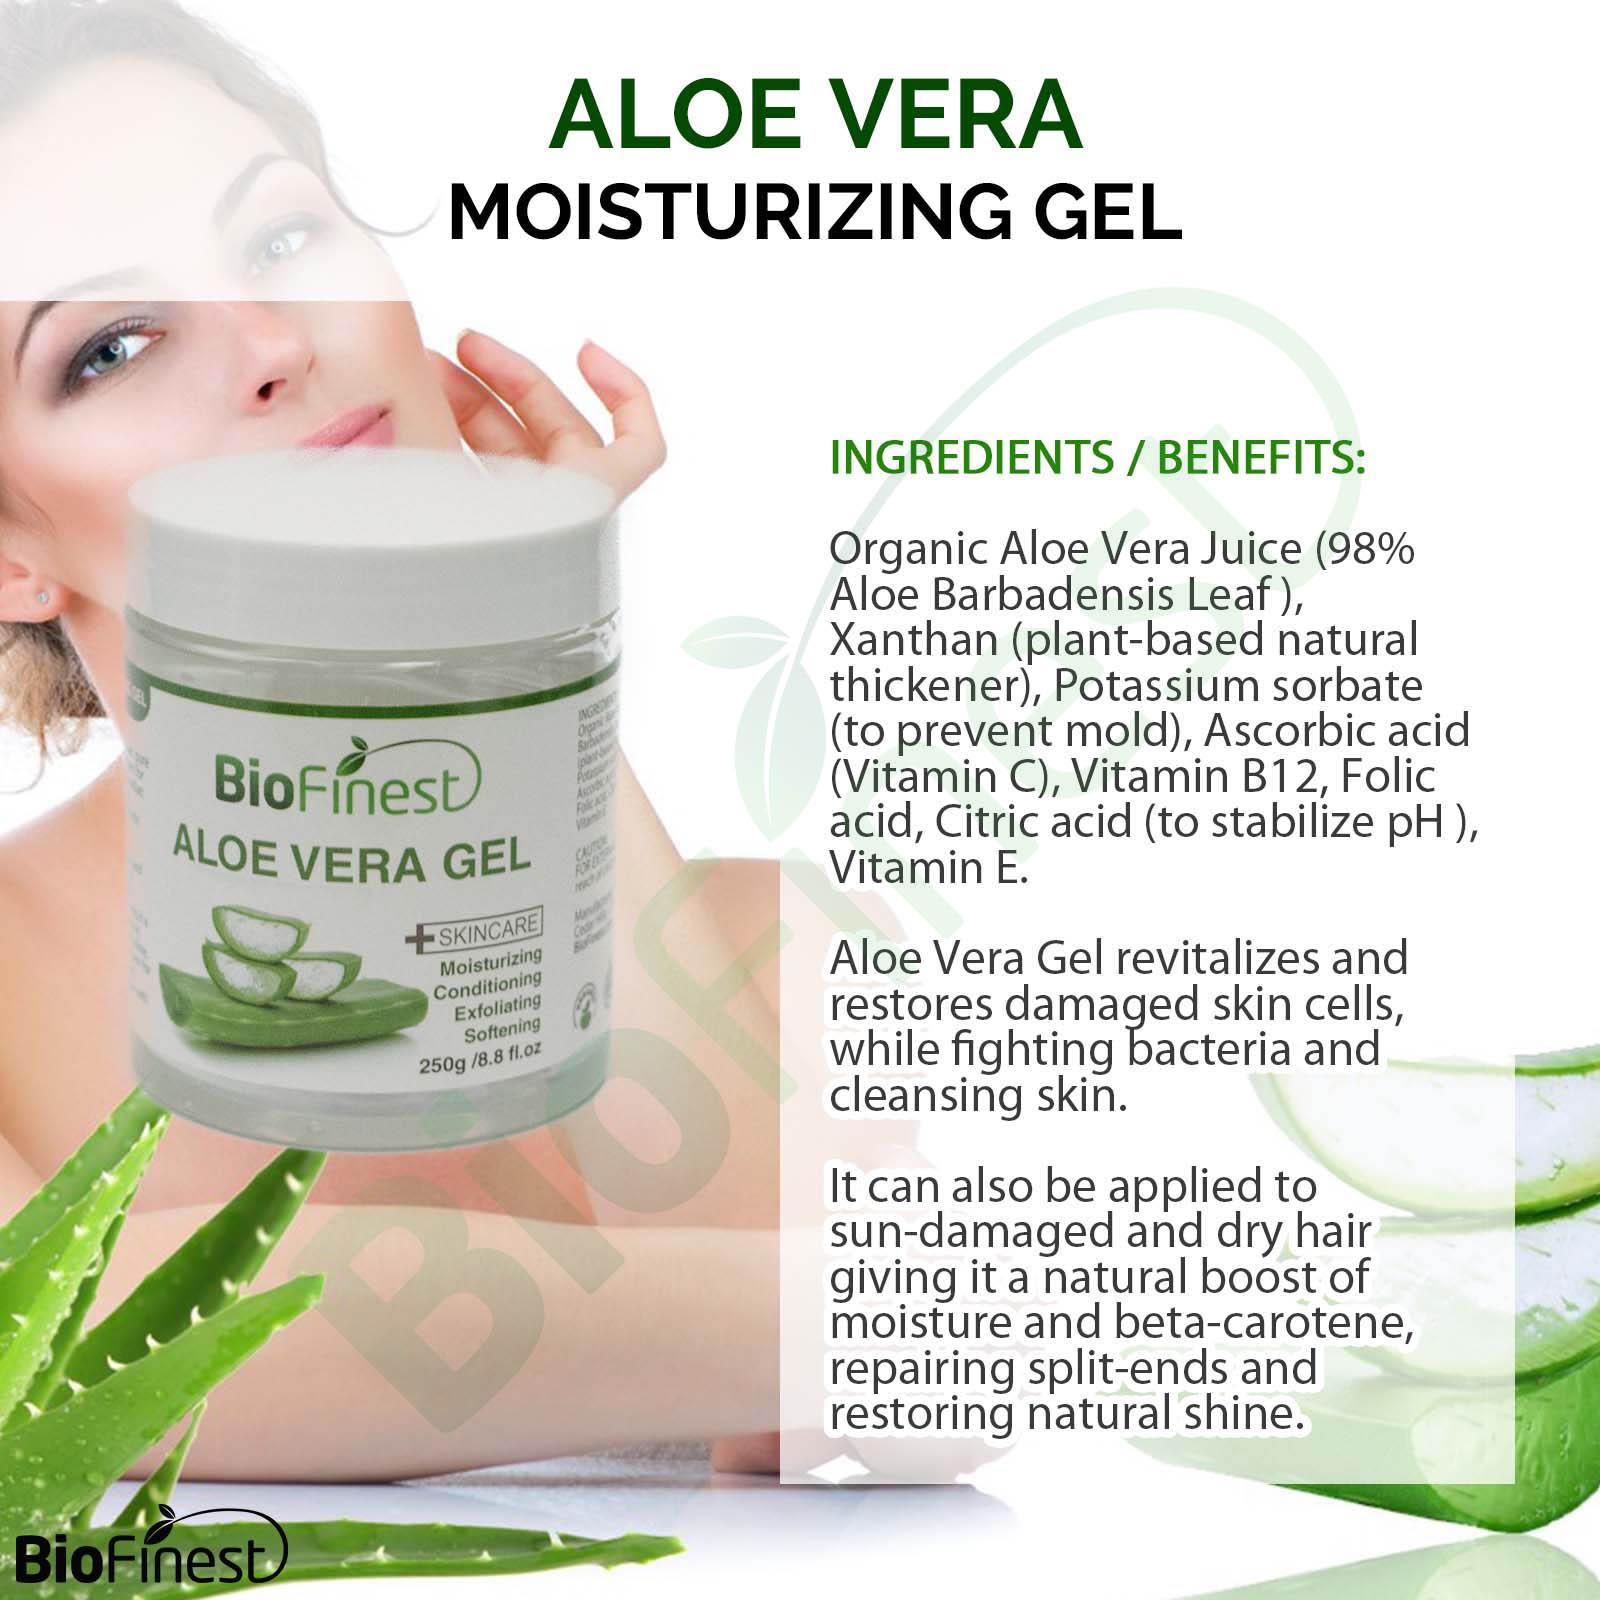 Aloe Vera Gel 2.jpg